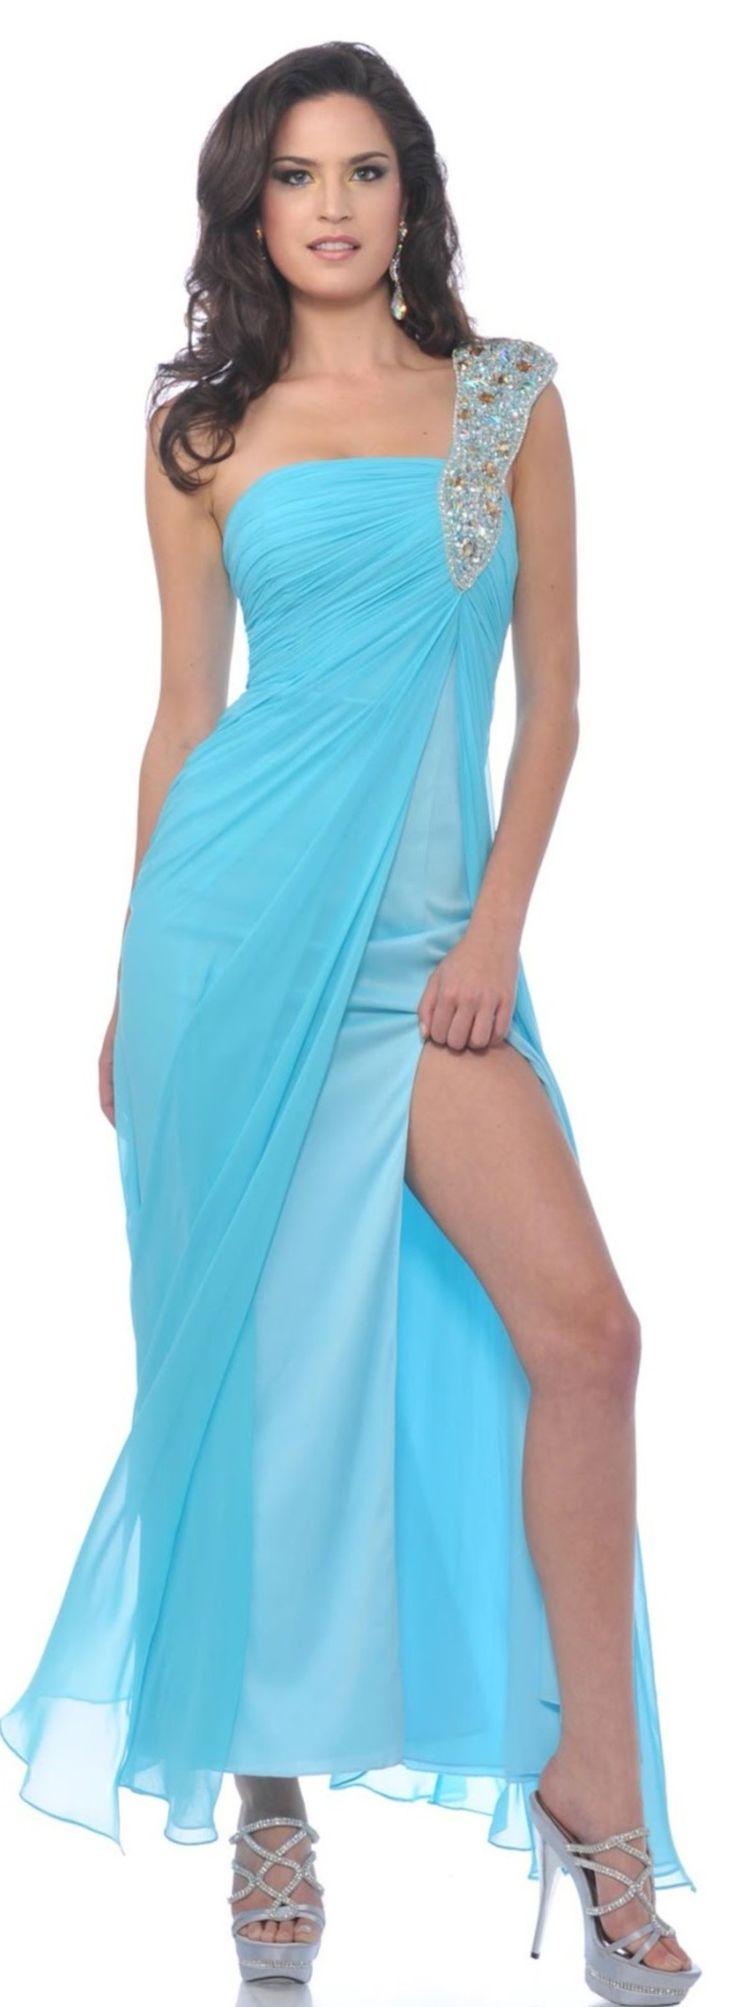 33 best 1950s inspired formal dress images on Pinterest | Formal ...